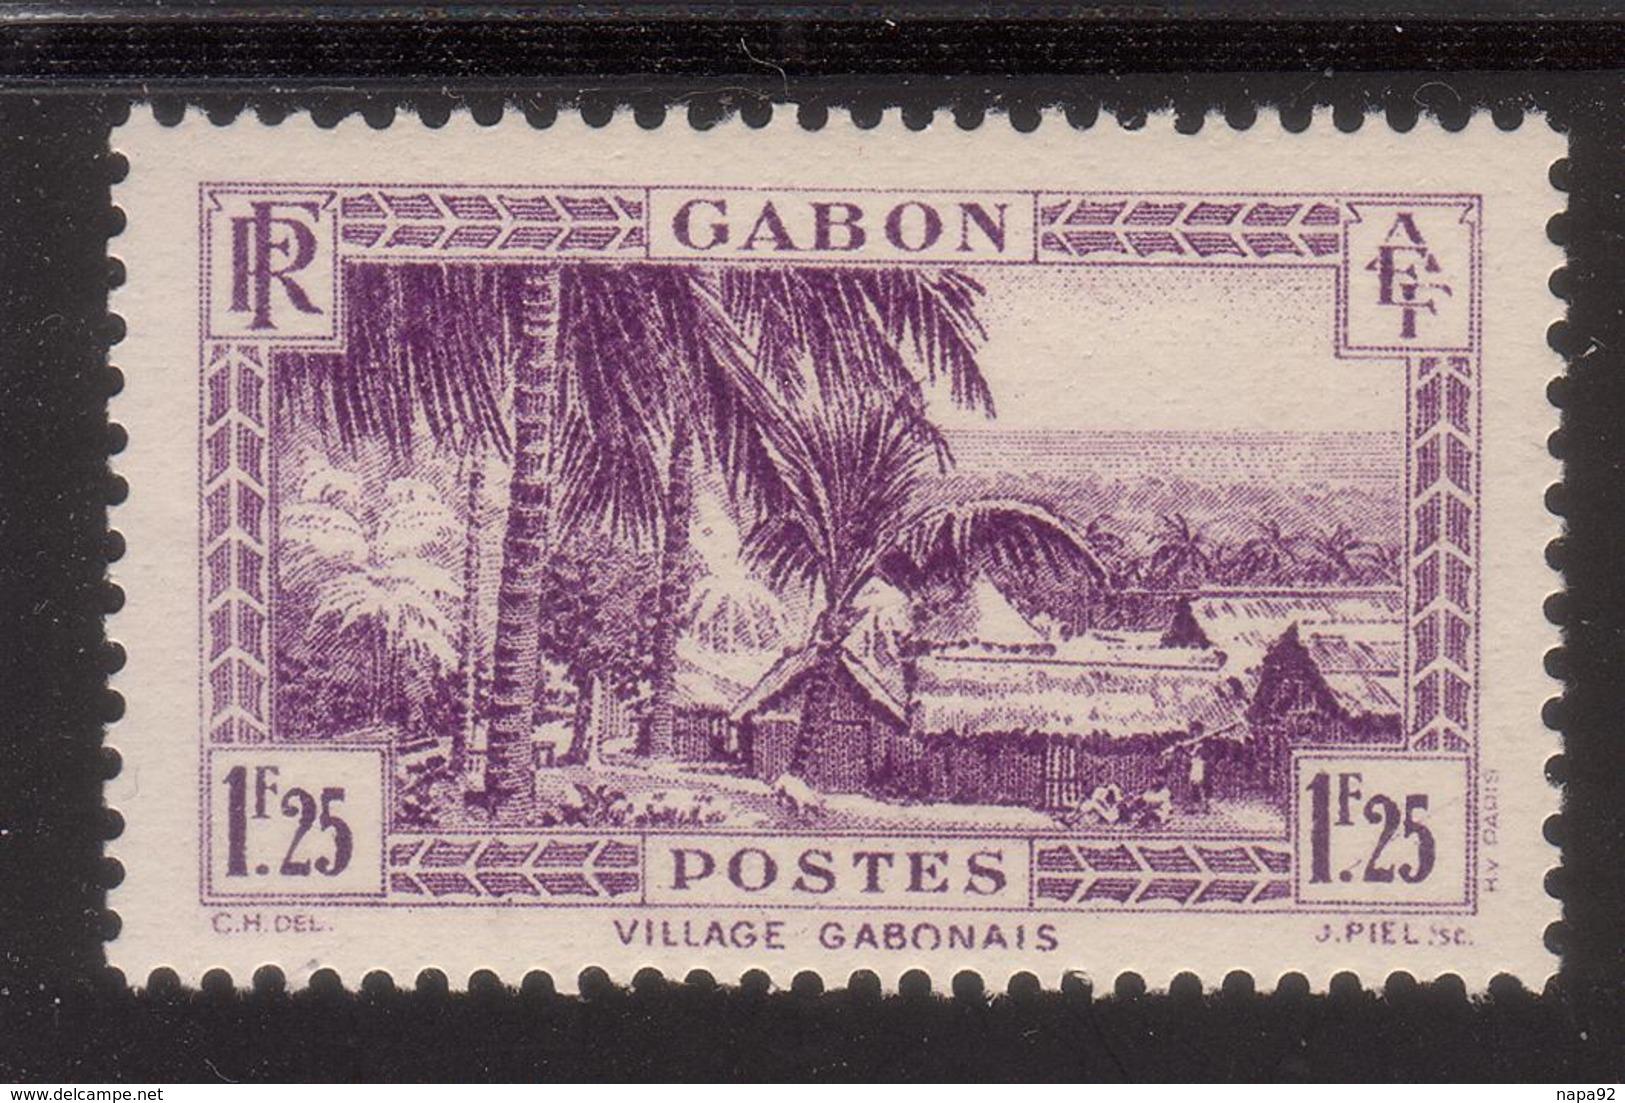 GABON 1933 YT 140A** - MNH - SANS CHARNIERE NI TRACE - Ongebruikt